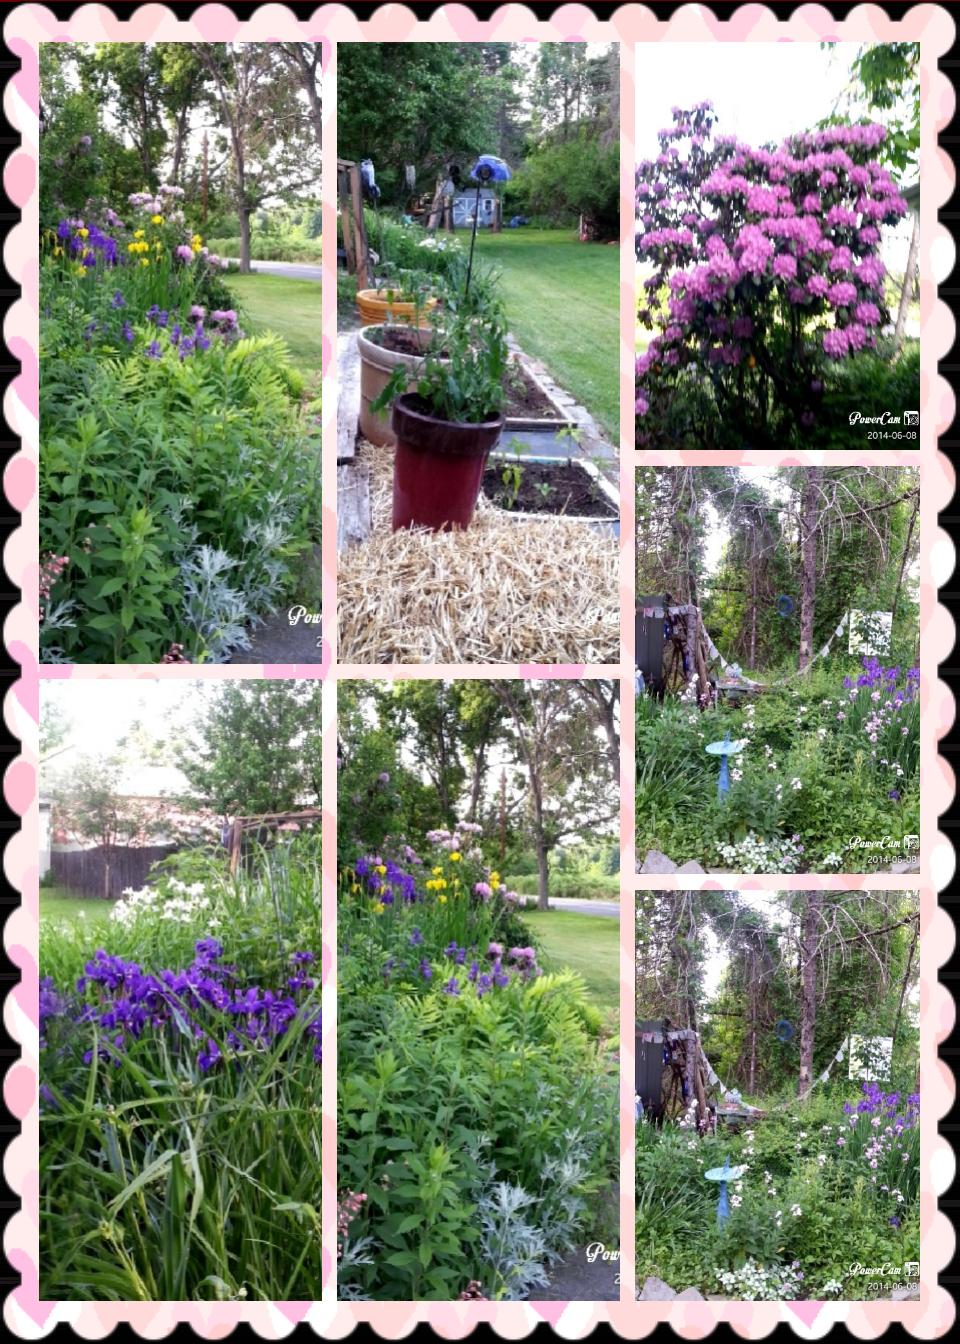 My Gardens - Magazine cover